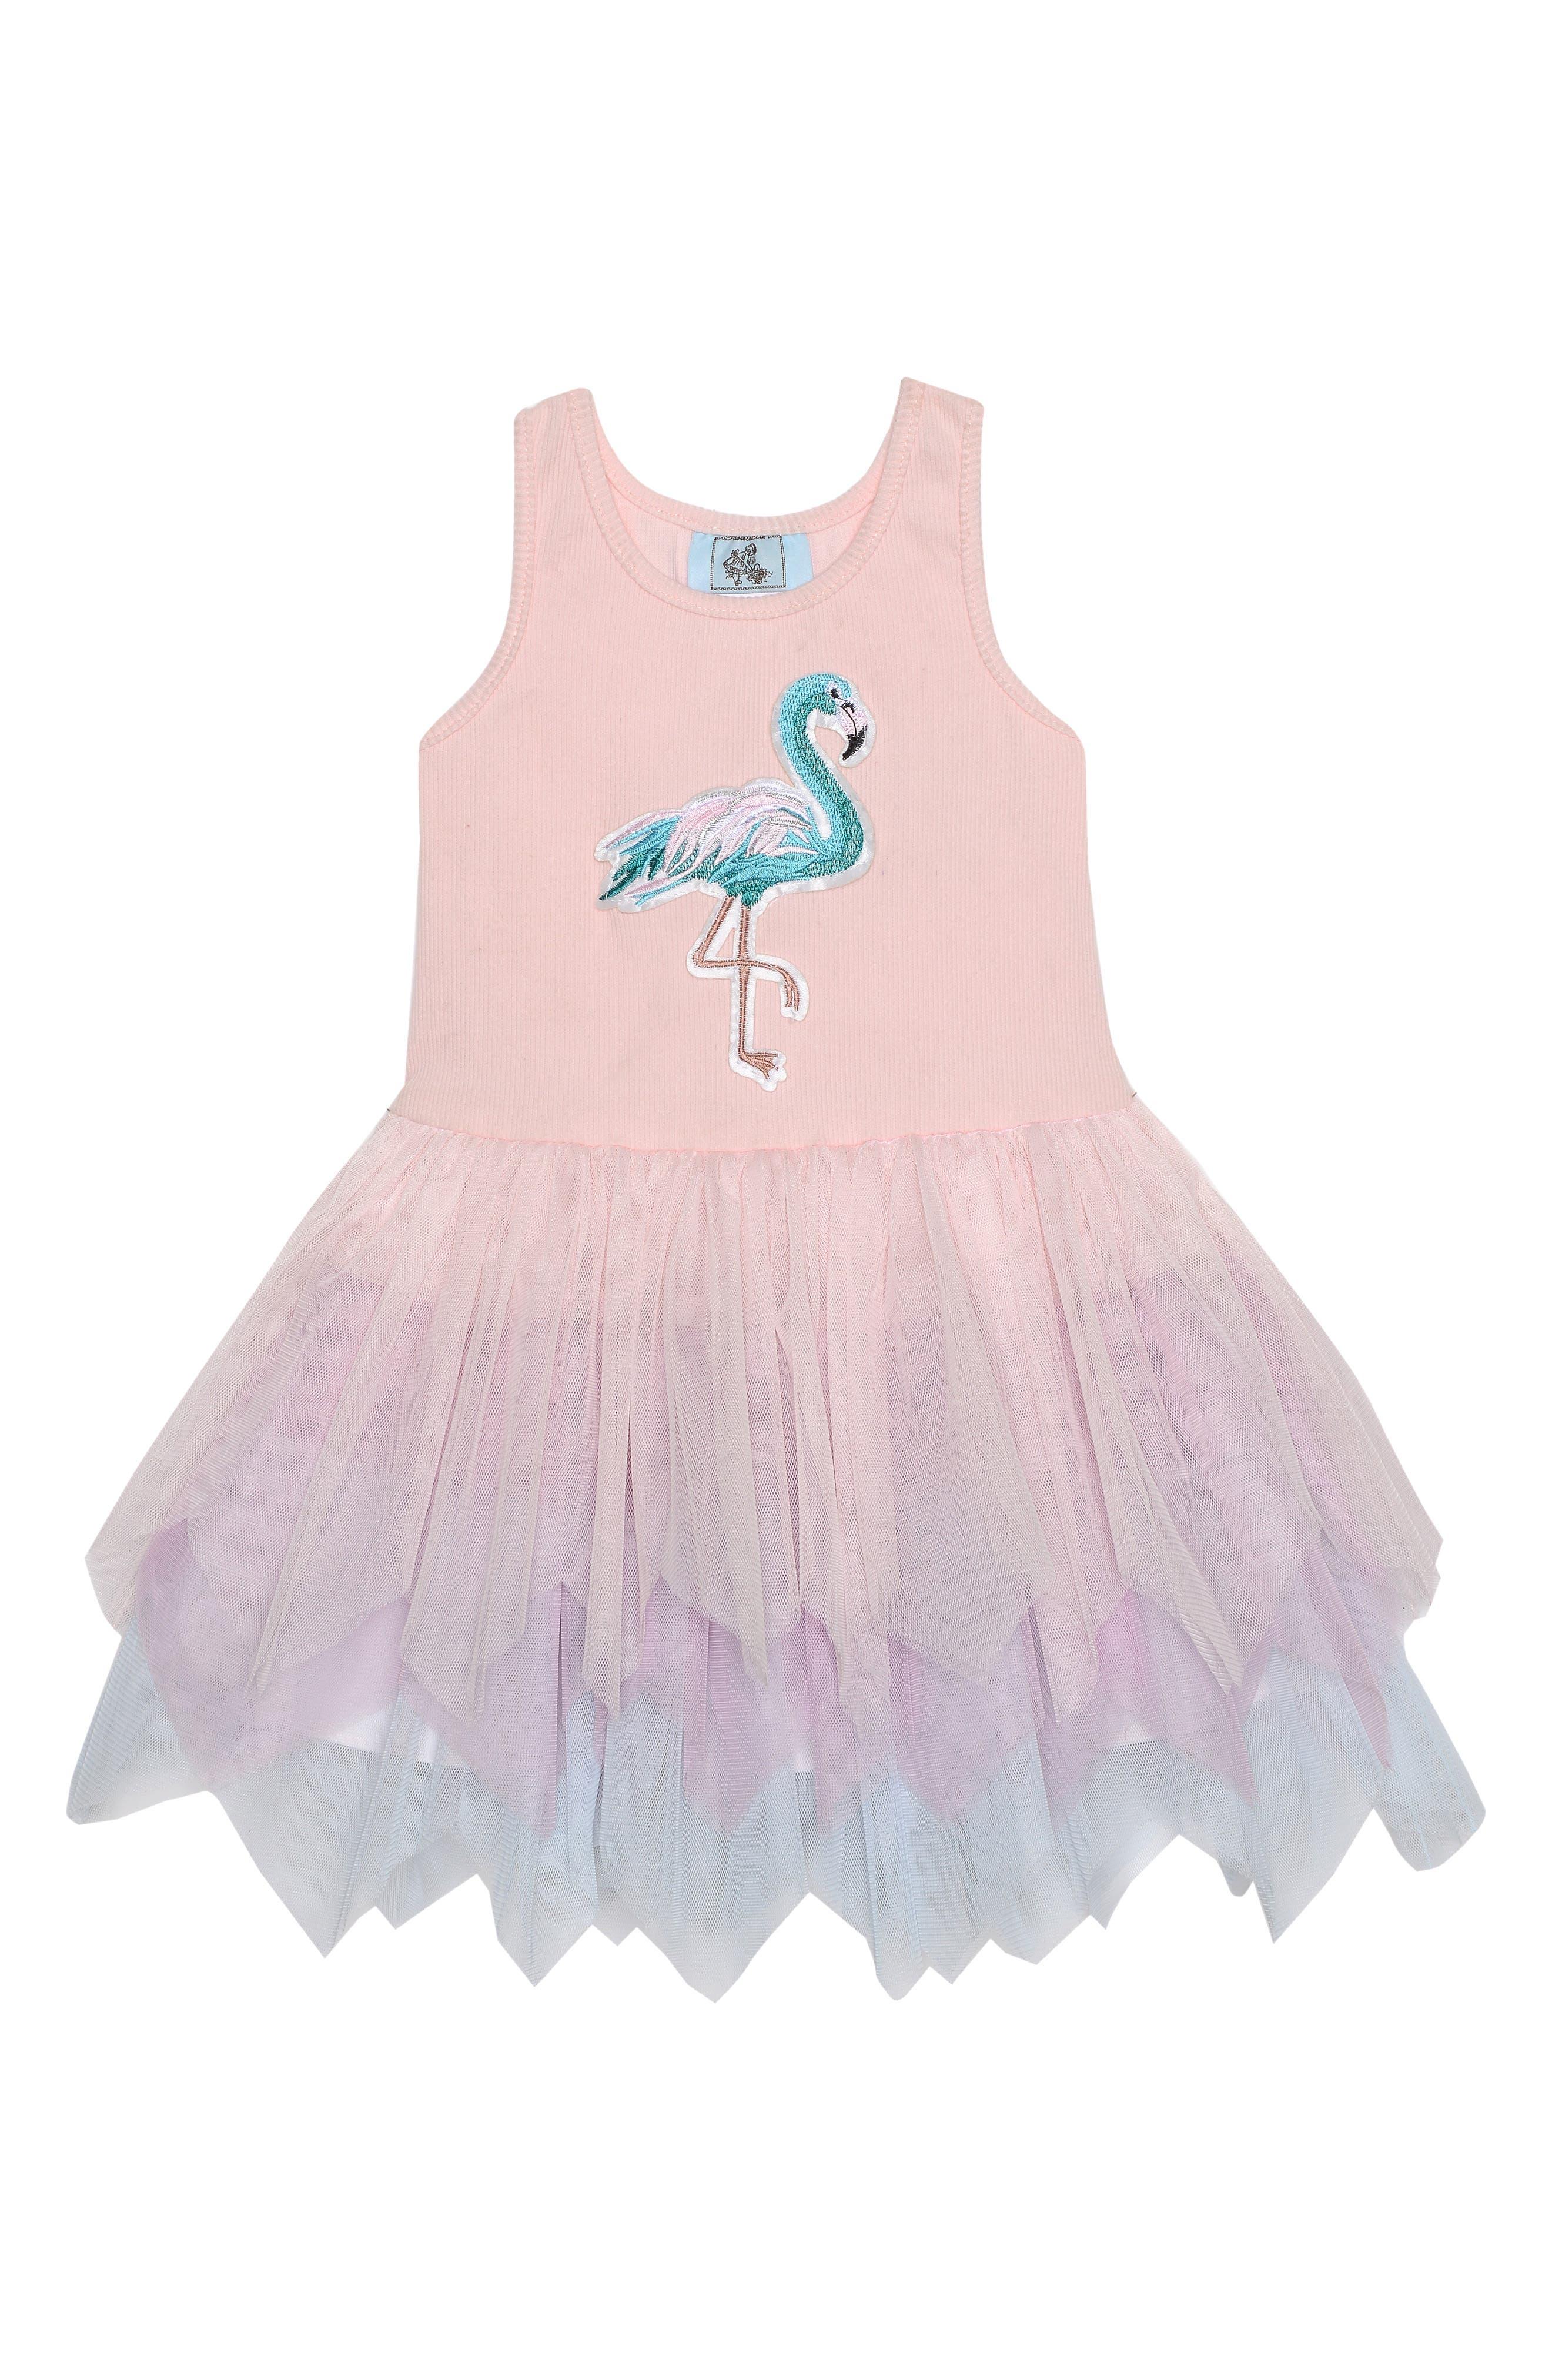 Image of Pippa & Julie Flamingo Tutu Tank Dress